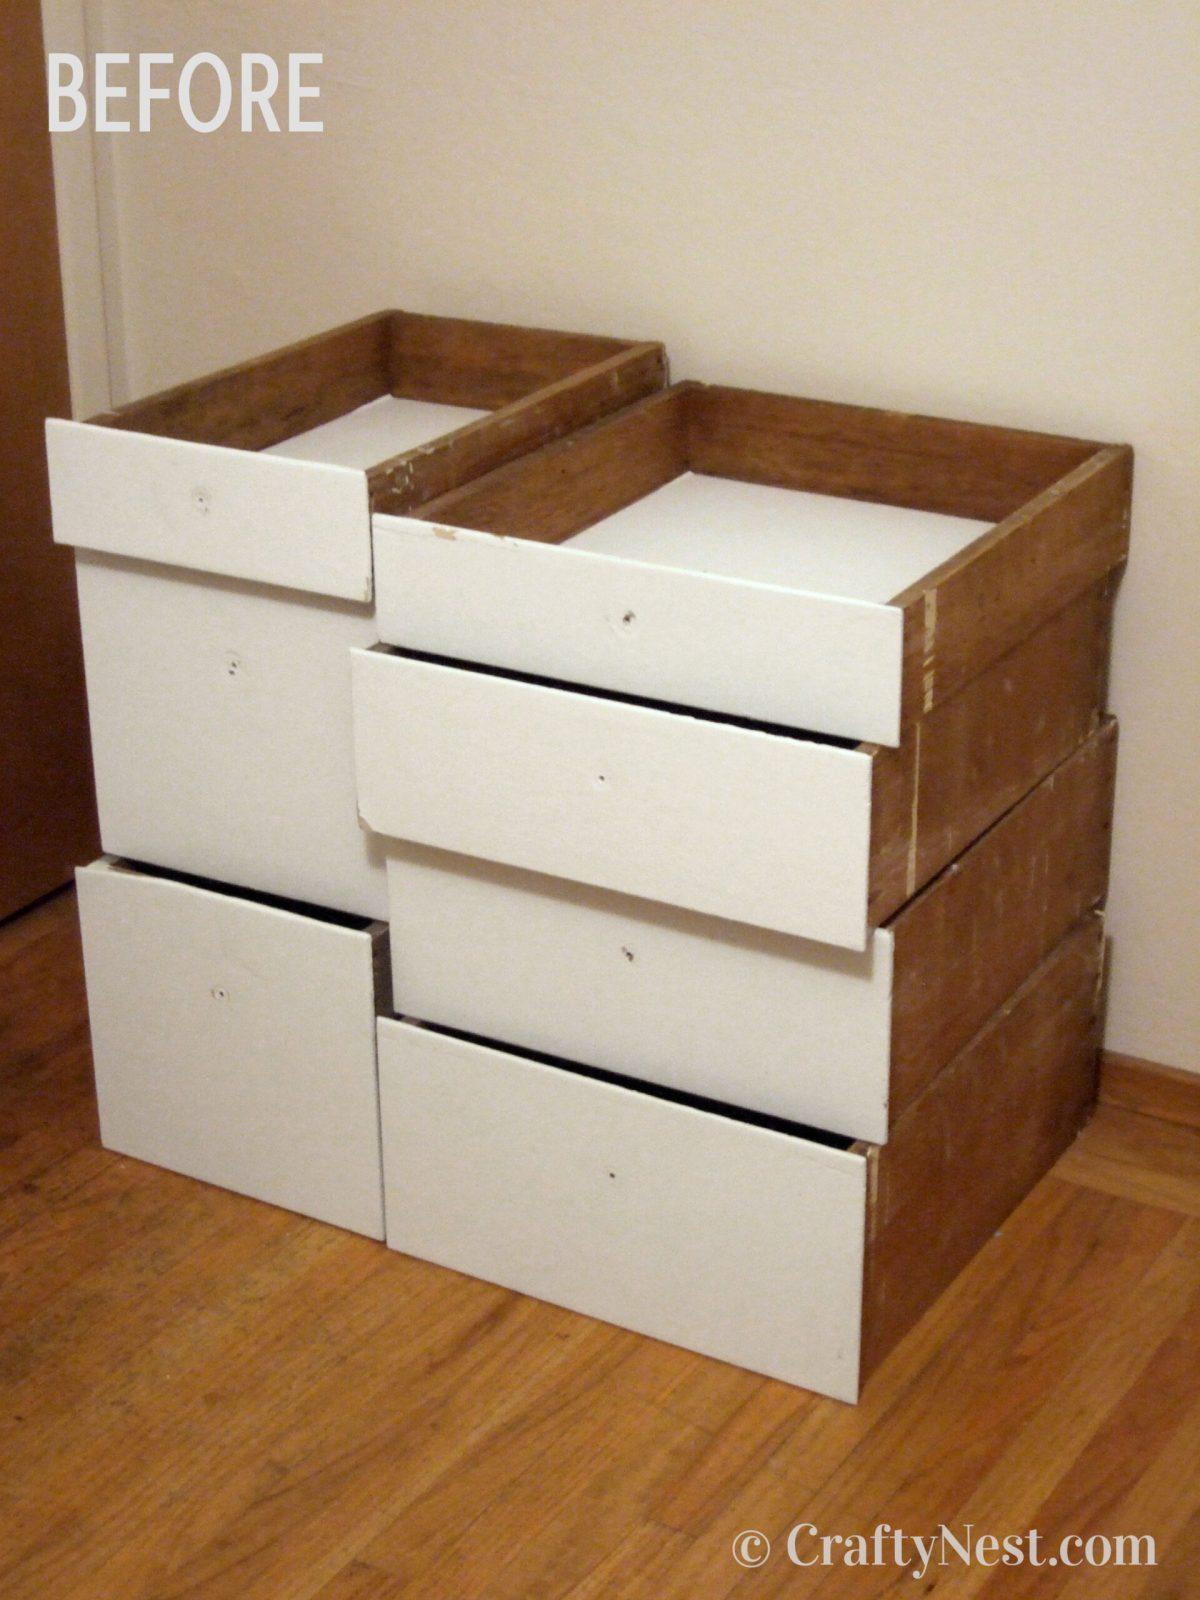 Salvaged drawers, before photo